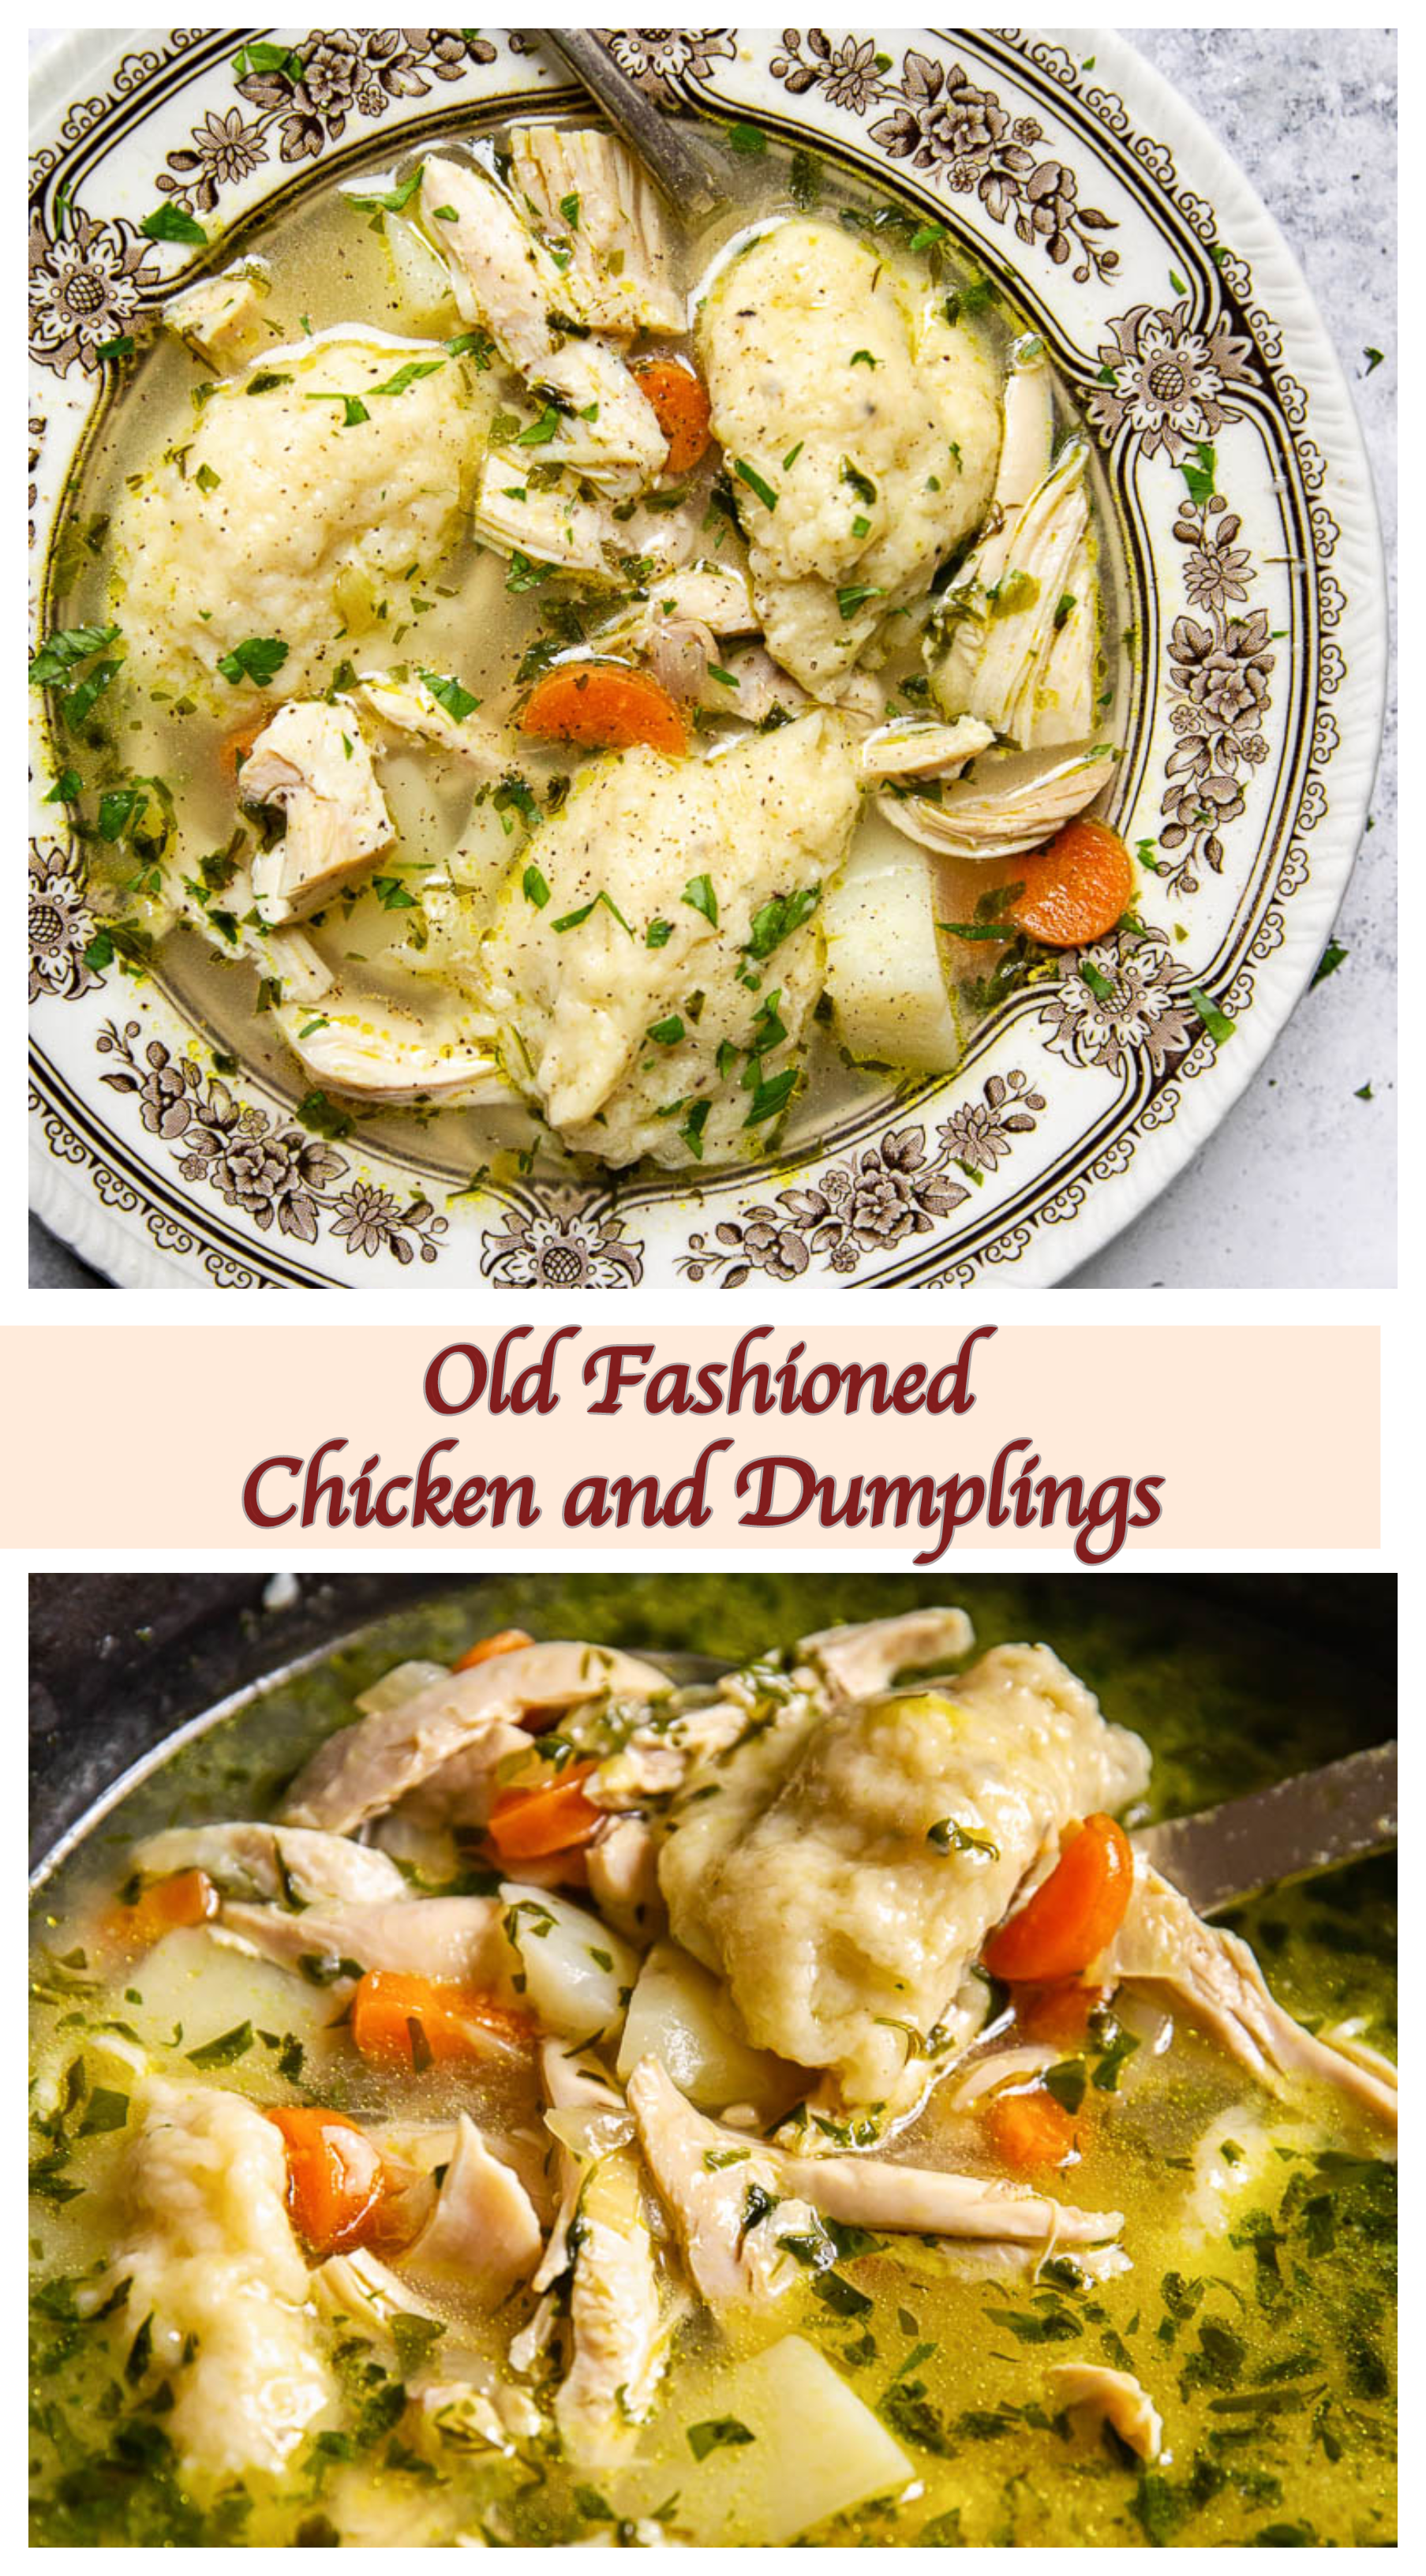 Chicken And Dumpling Soup Chicken And Dumplings Chicken Recipes Dumplings For Soup